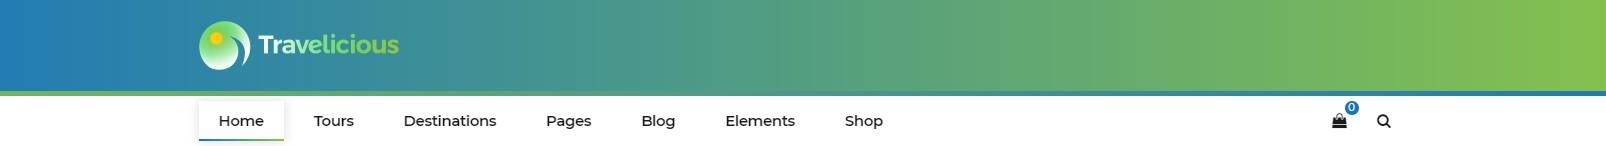 https://documentation.bold-themes.com/travelicious/wp-content/uploads/sites/37/2018/10/header-alternate-gradient.jpg